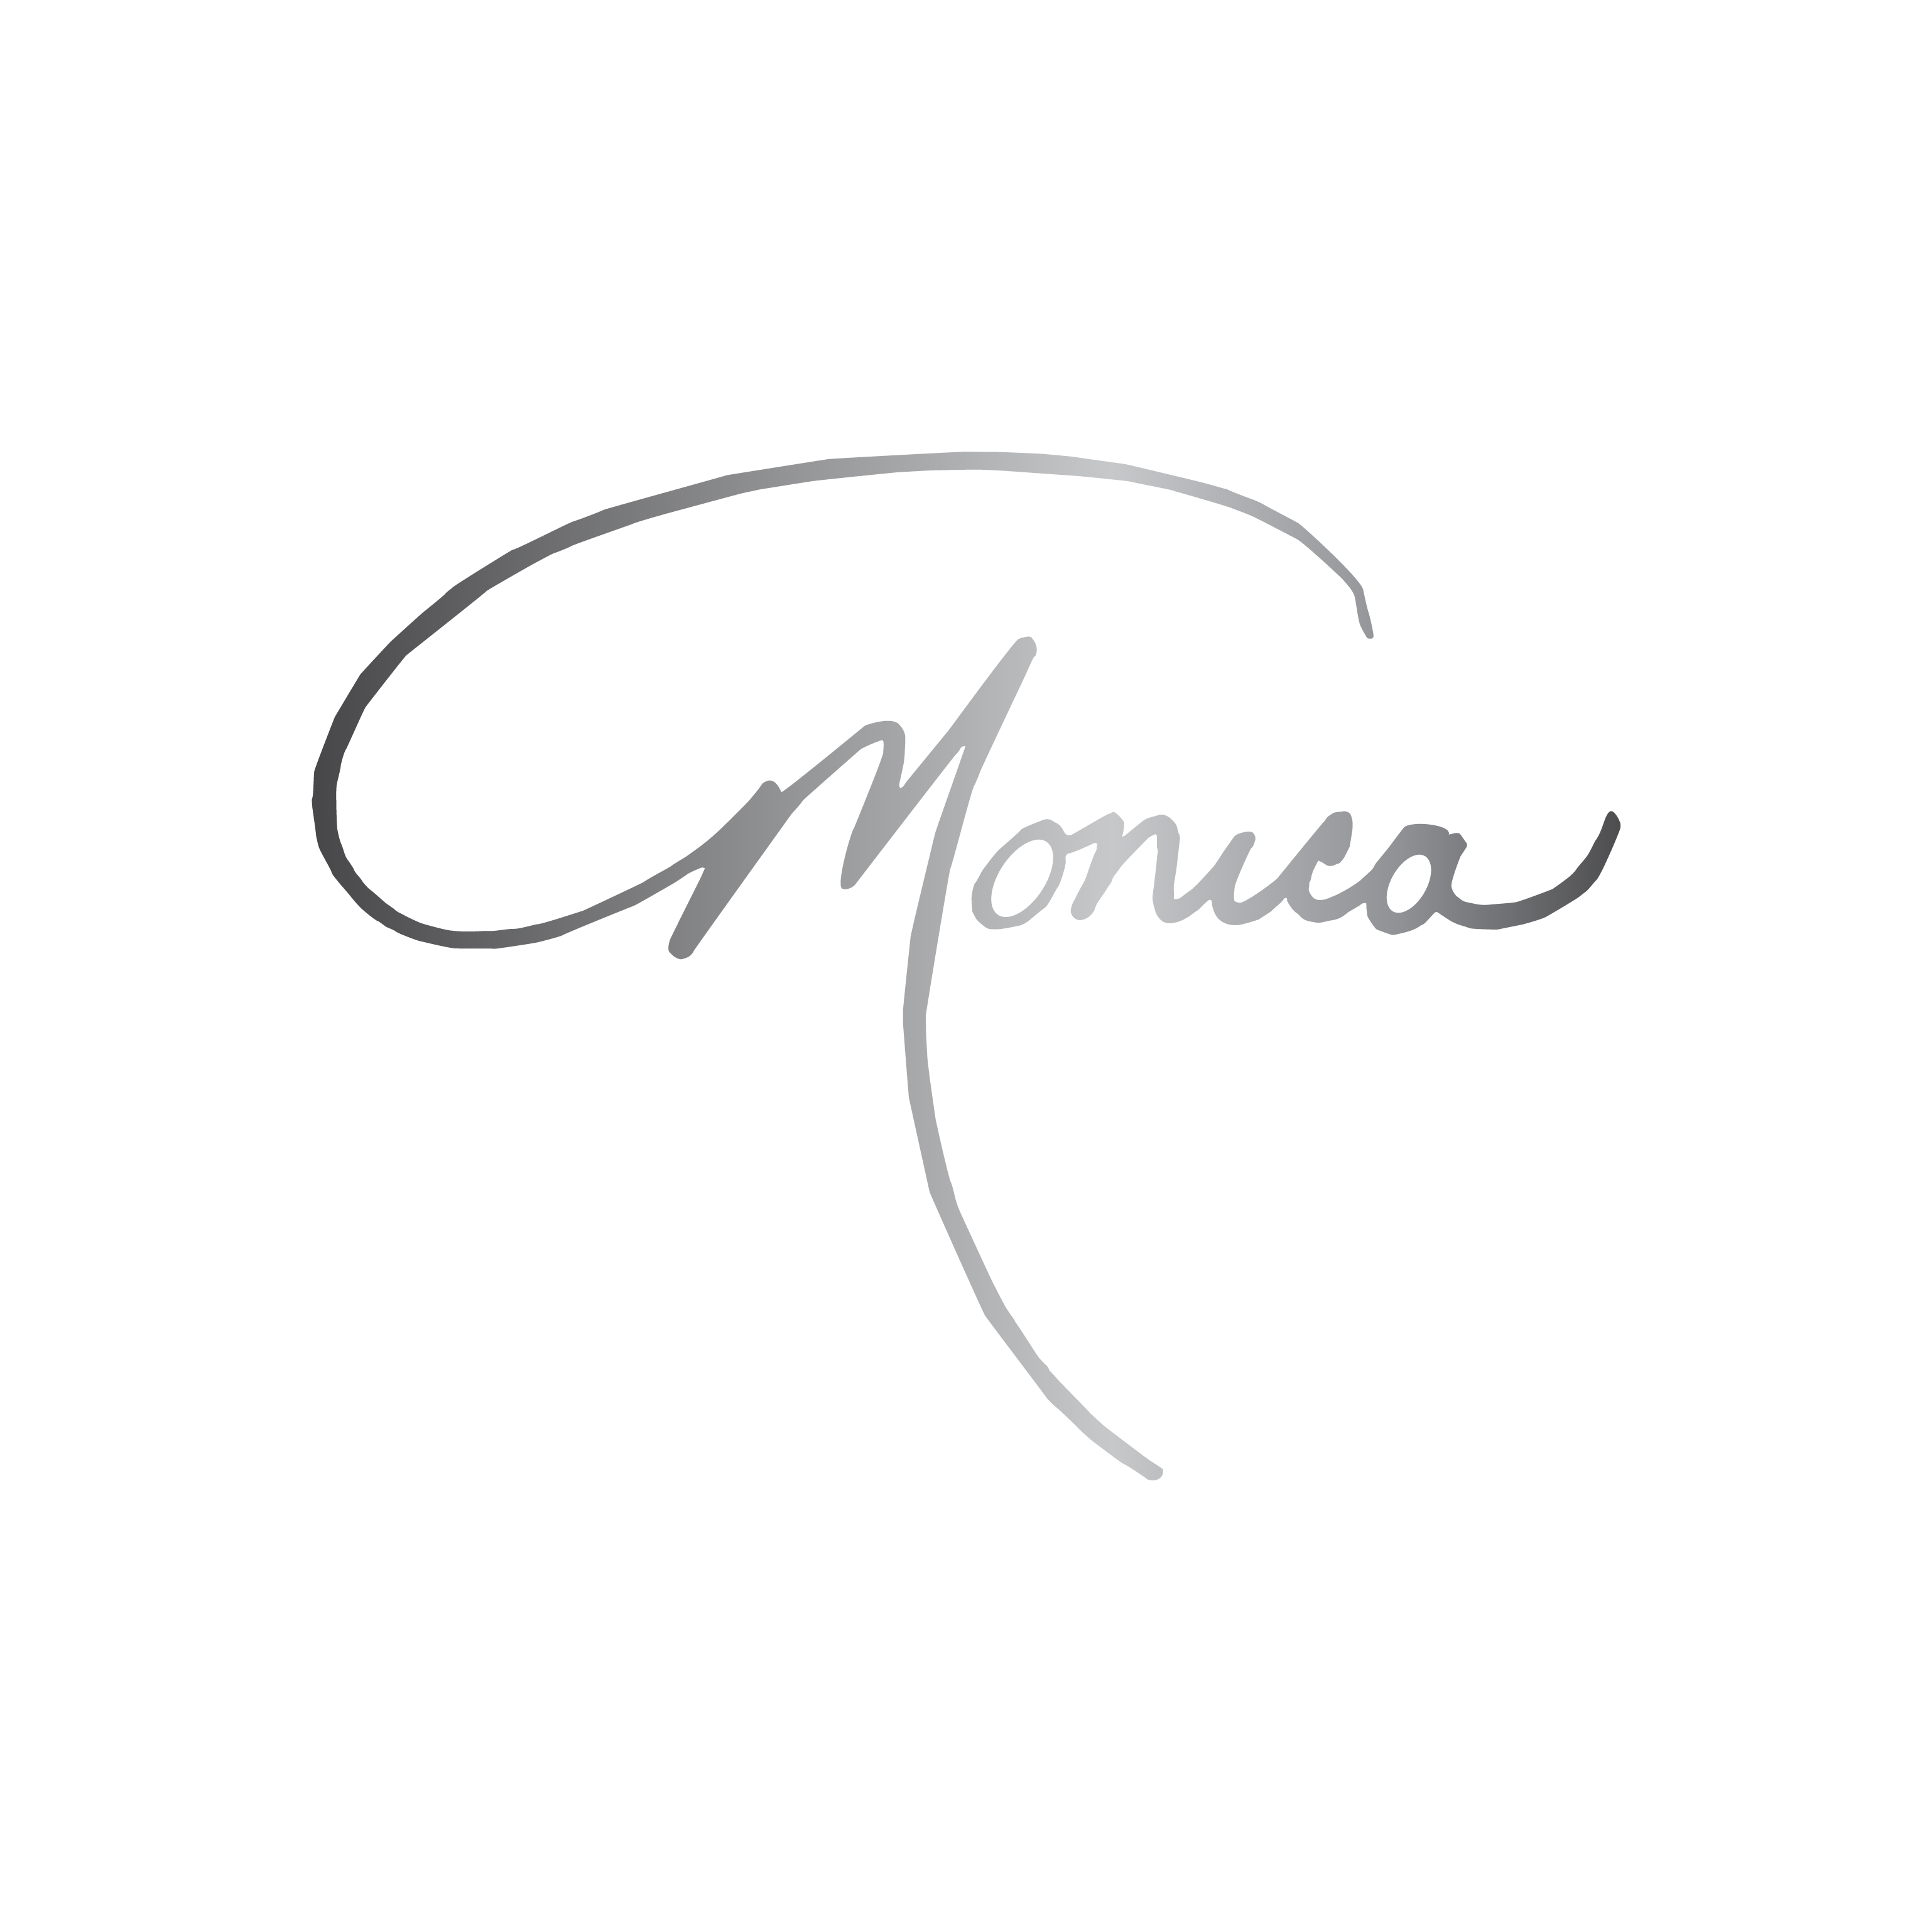 The Monica